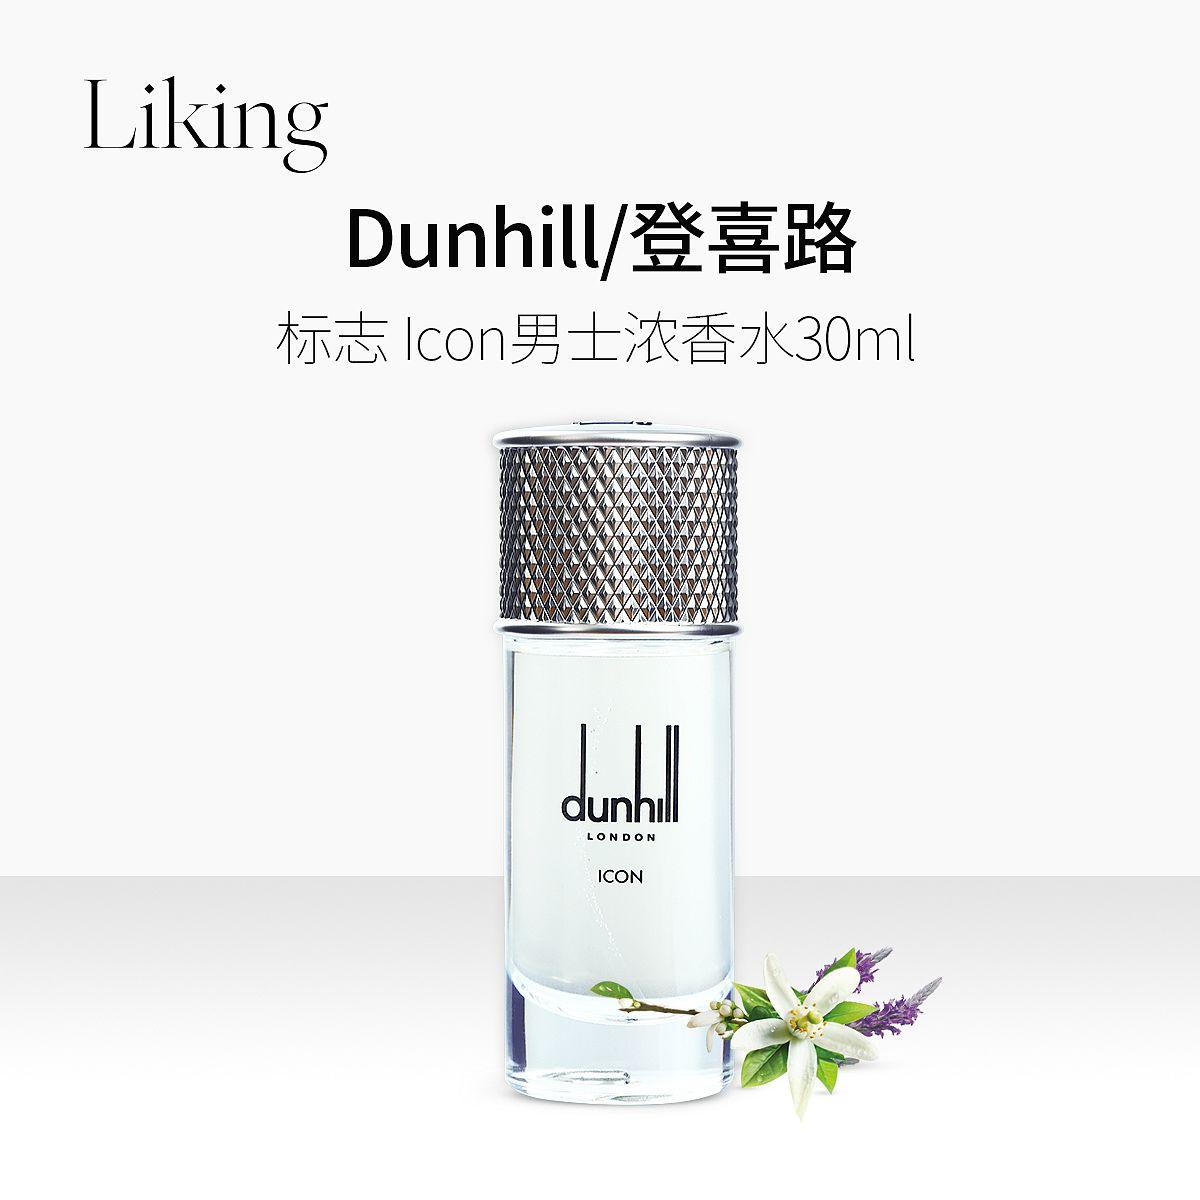 Alfred Dunhill 登喜路 标志 Icon男士浓香水 30ml木质馥奇香调